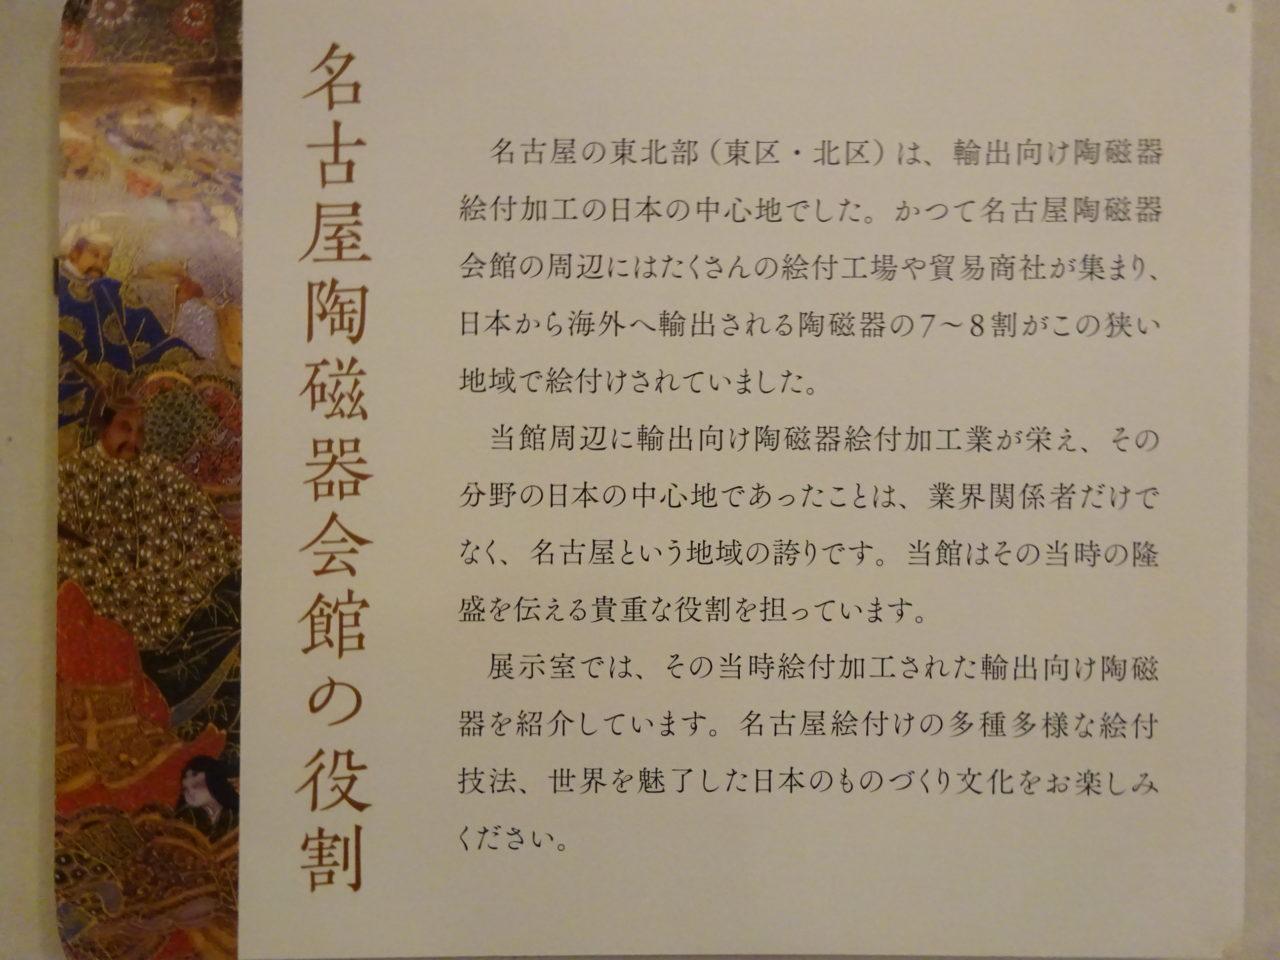 陶磁器会館の役割